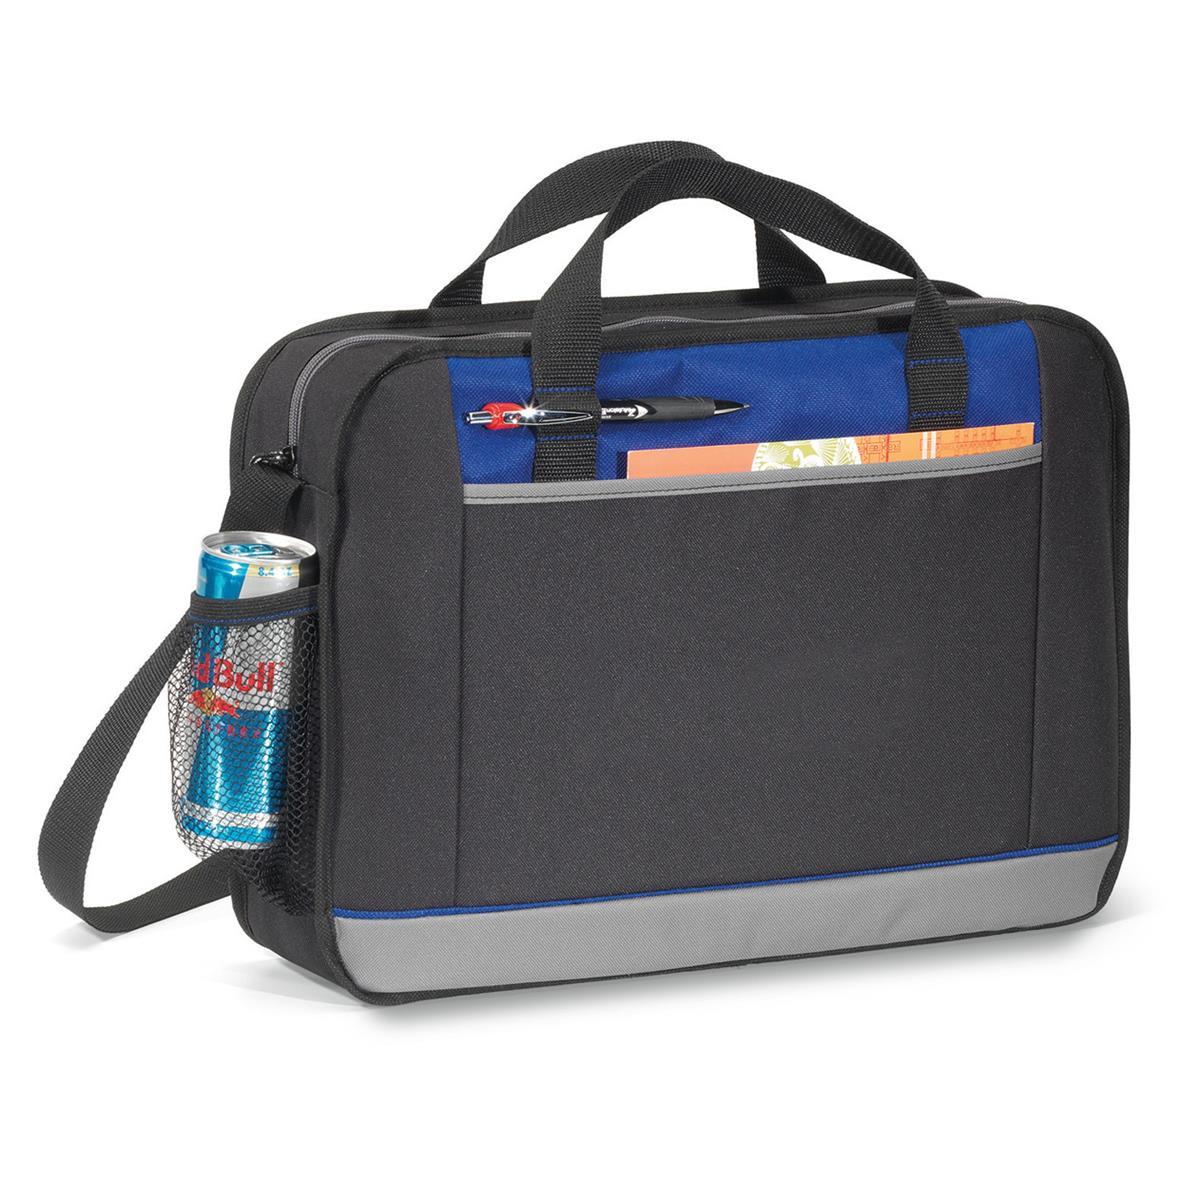 Printed Laptop Bag Promotional bags.jpg